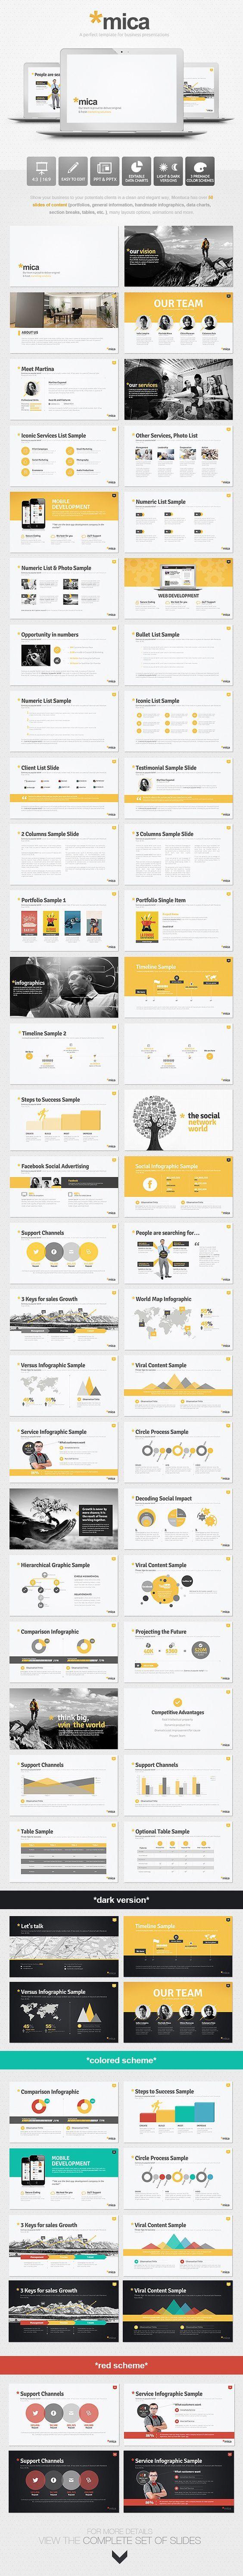 Mica Powerpoint Presentation Template PowerPoint Template / Theme / Presentation / Slides / Background / Power Point #powerpoint #template #theme: